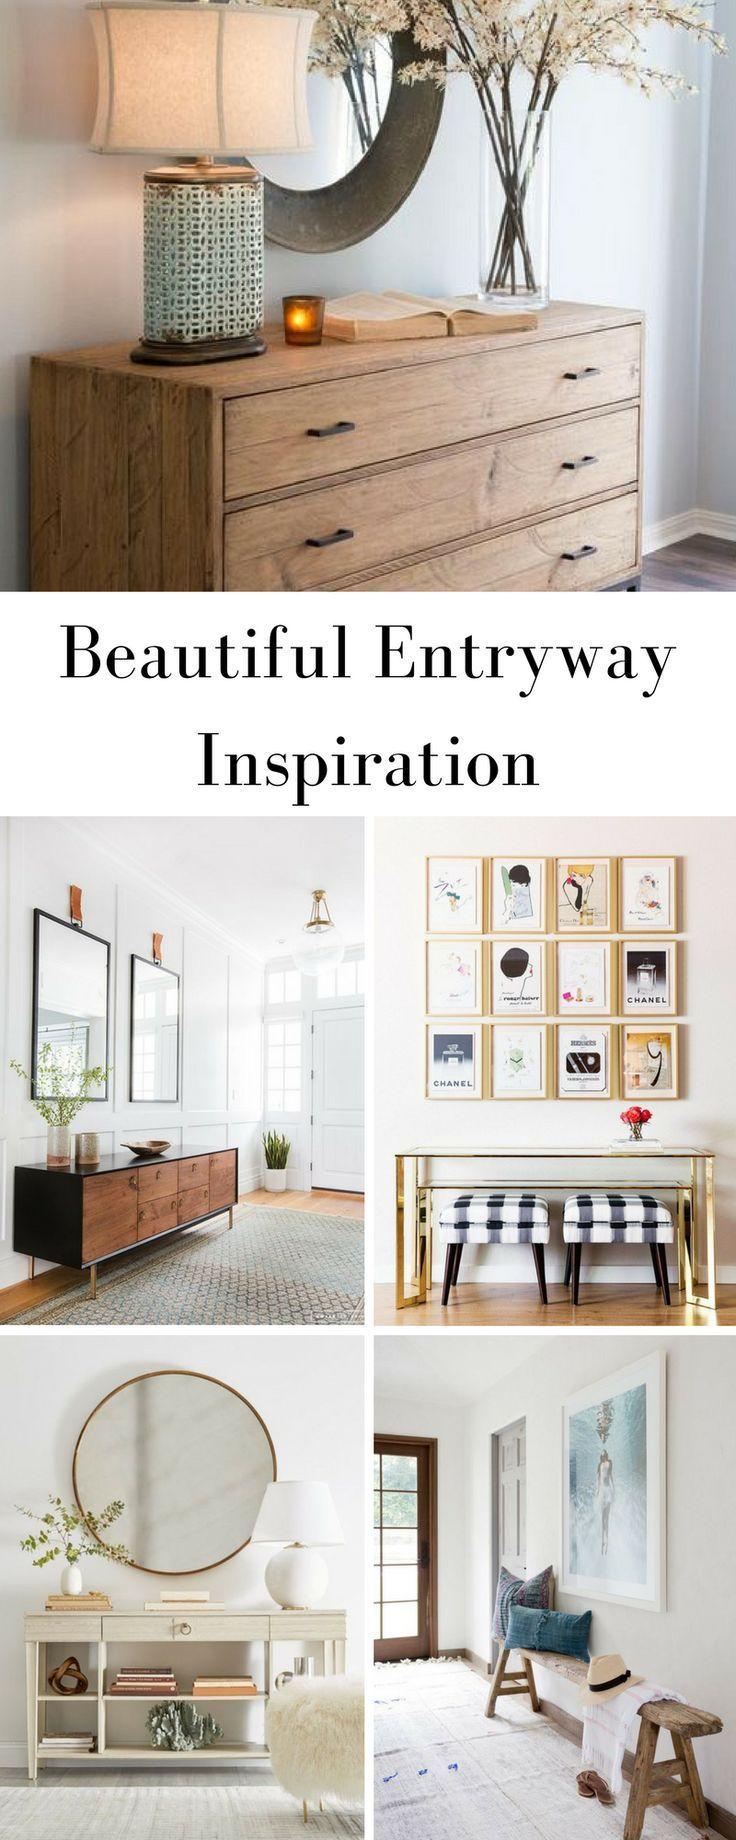 11 beautiful entryways minimal style with a big impact rh pinterest com